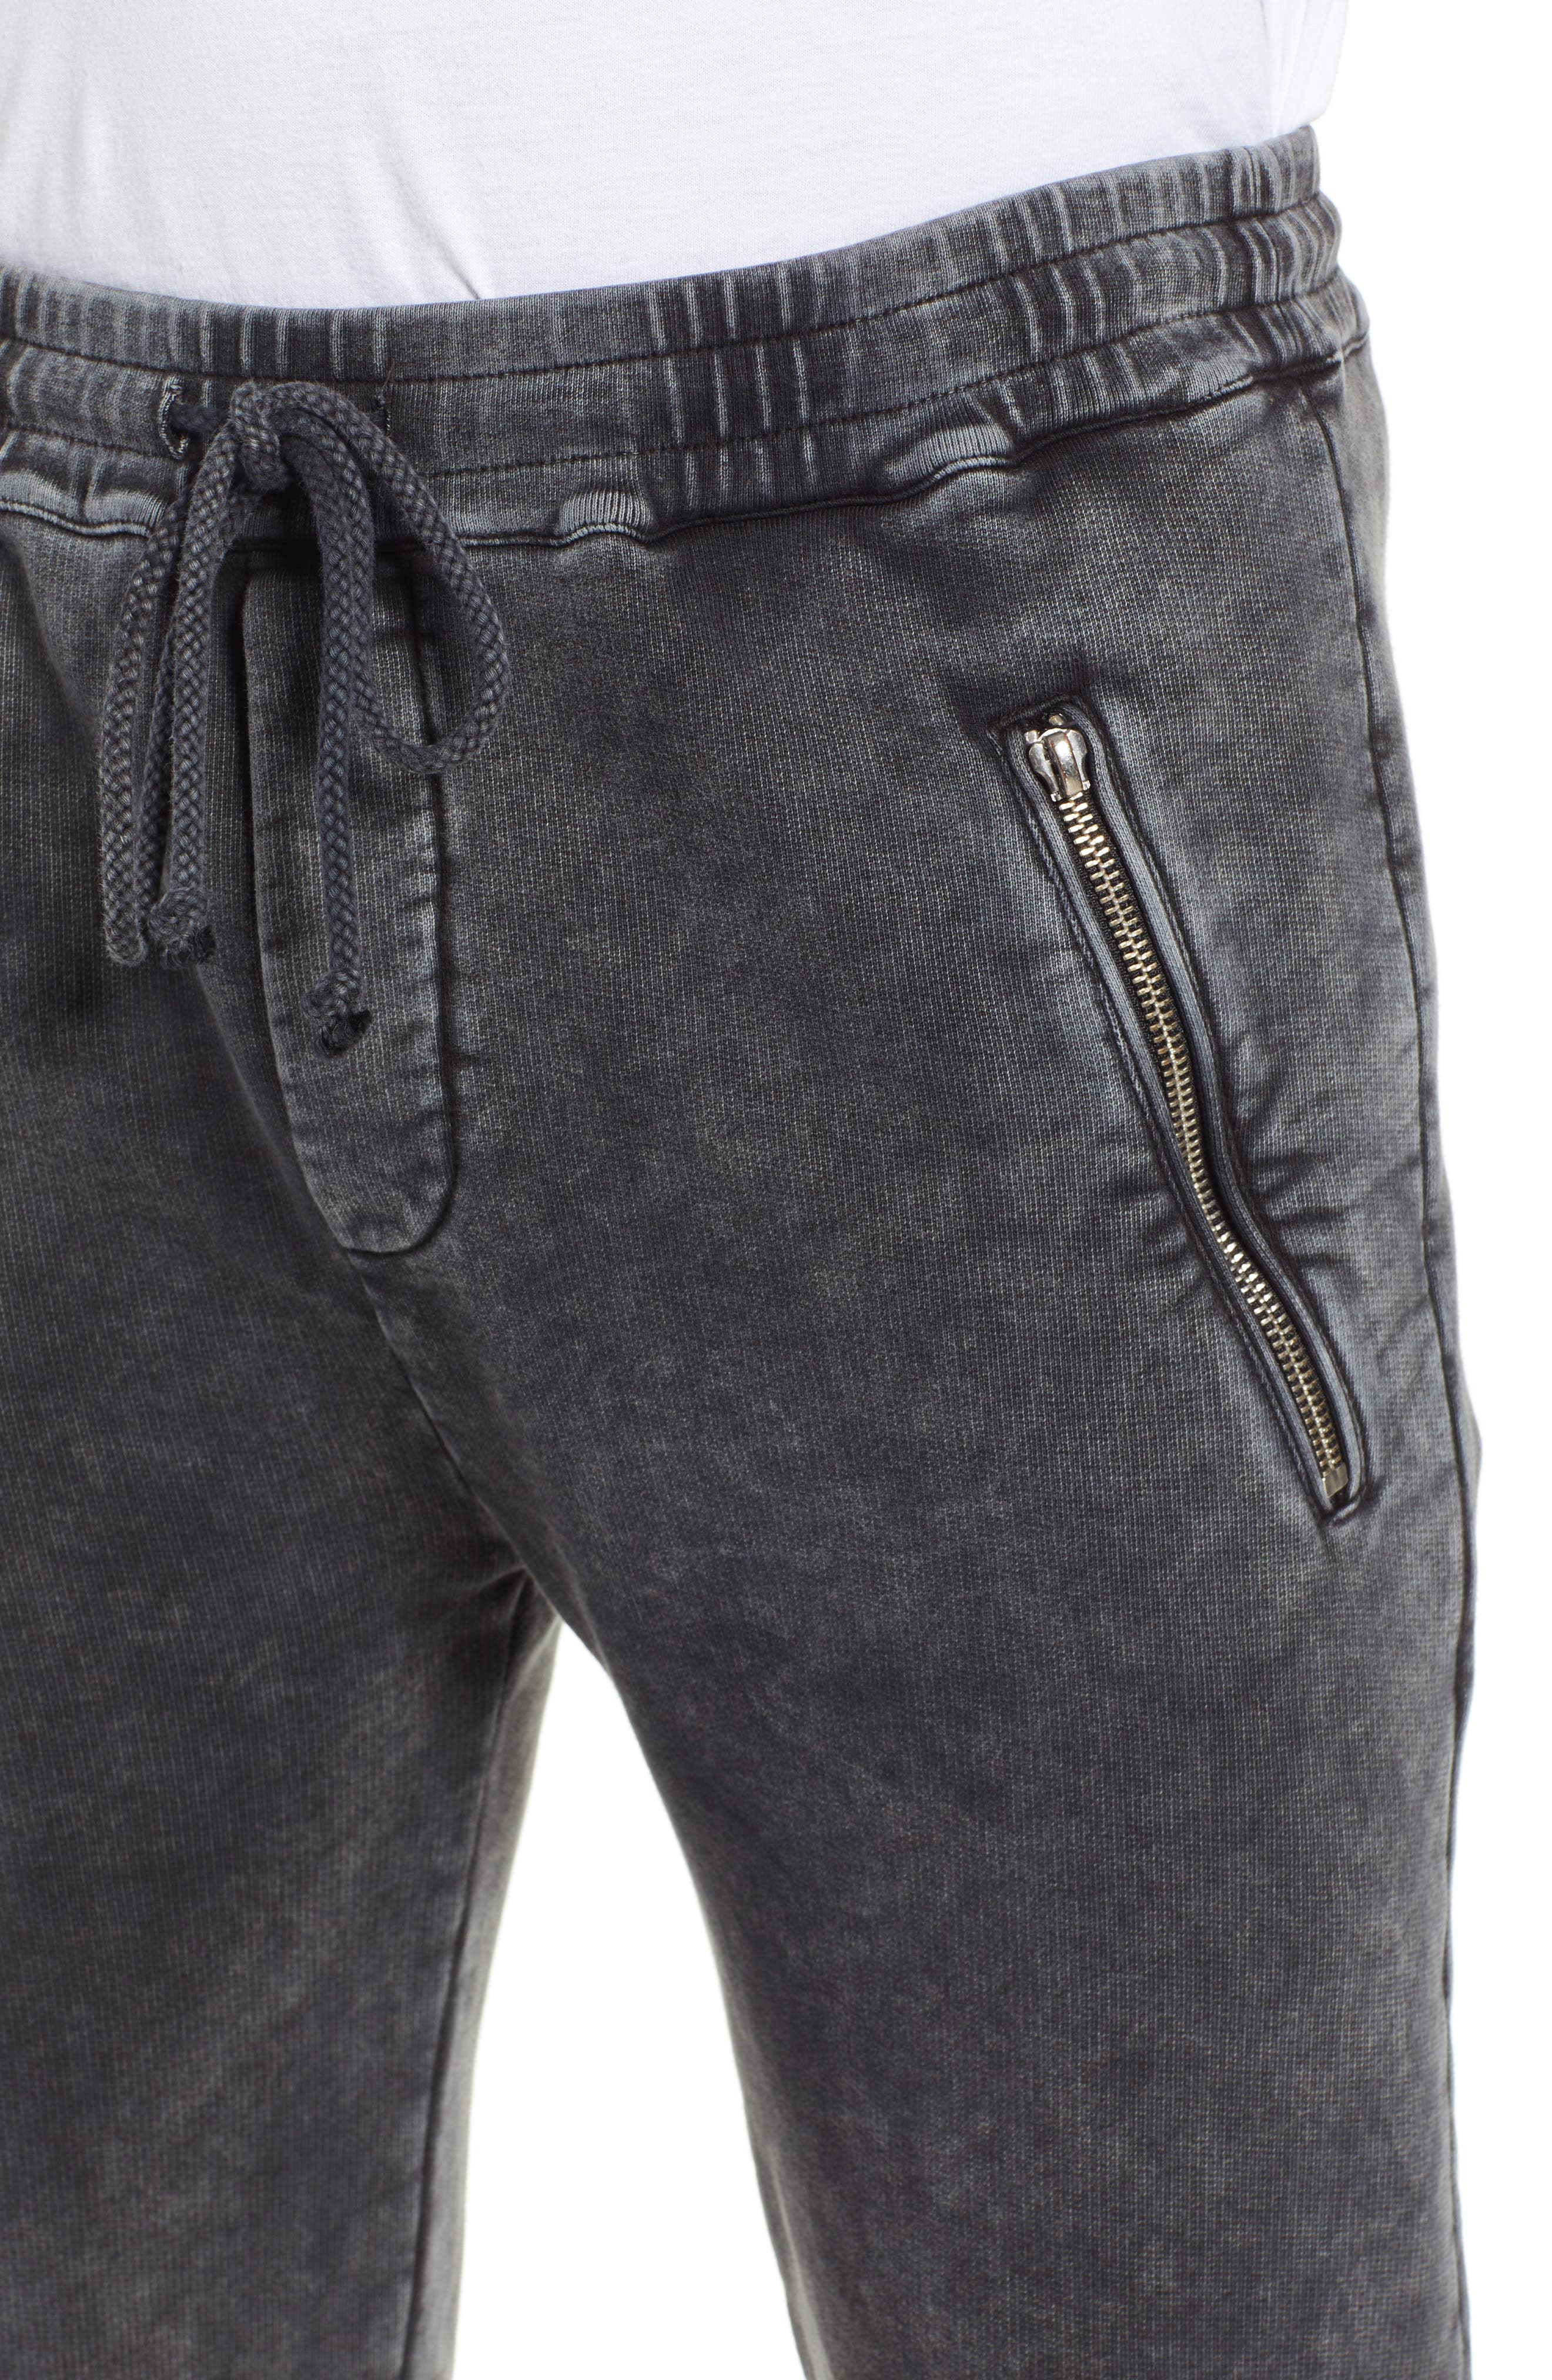 THE KOOPLES, Slim Fit Track Pants, Alternate thumbnail 4, color, BLACK WASHED